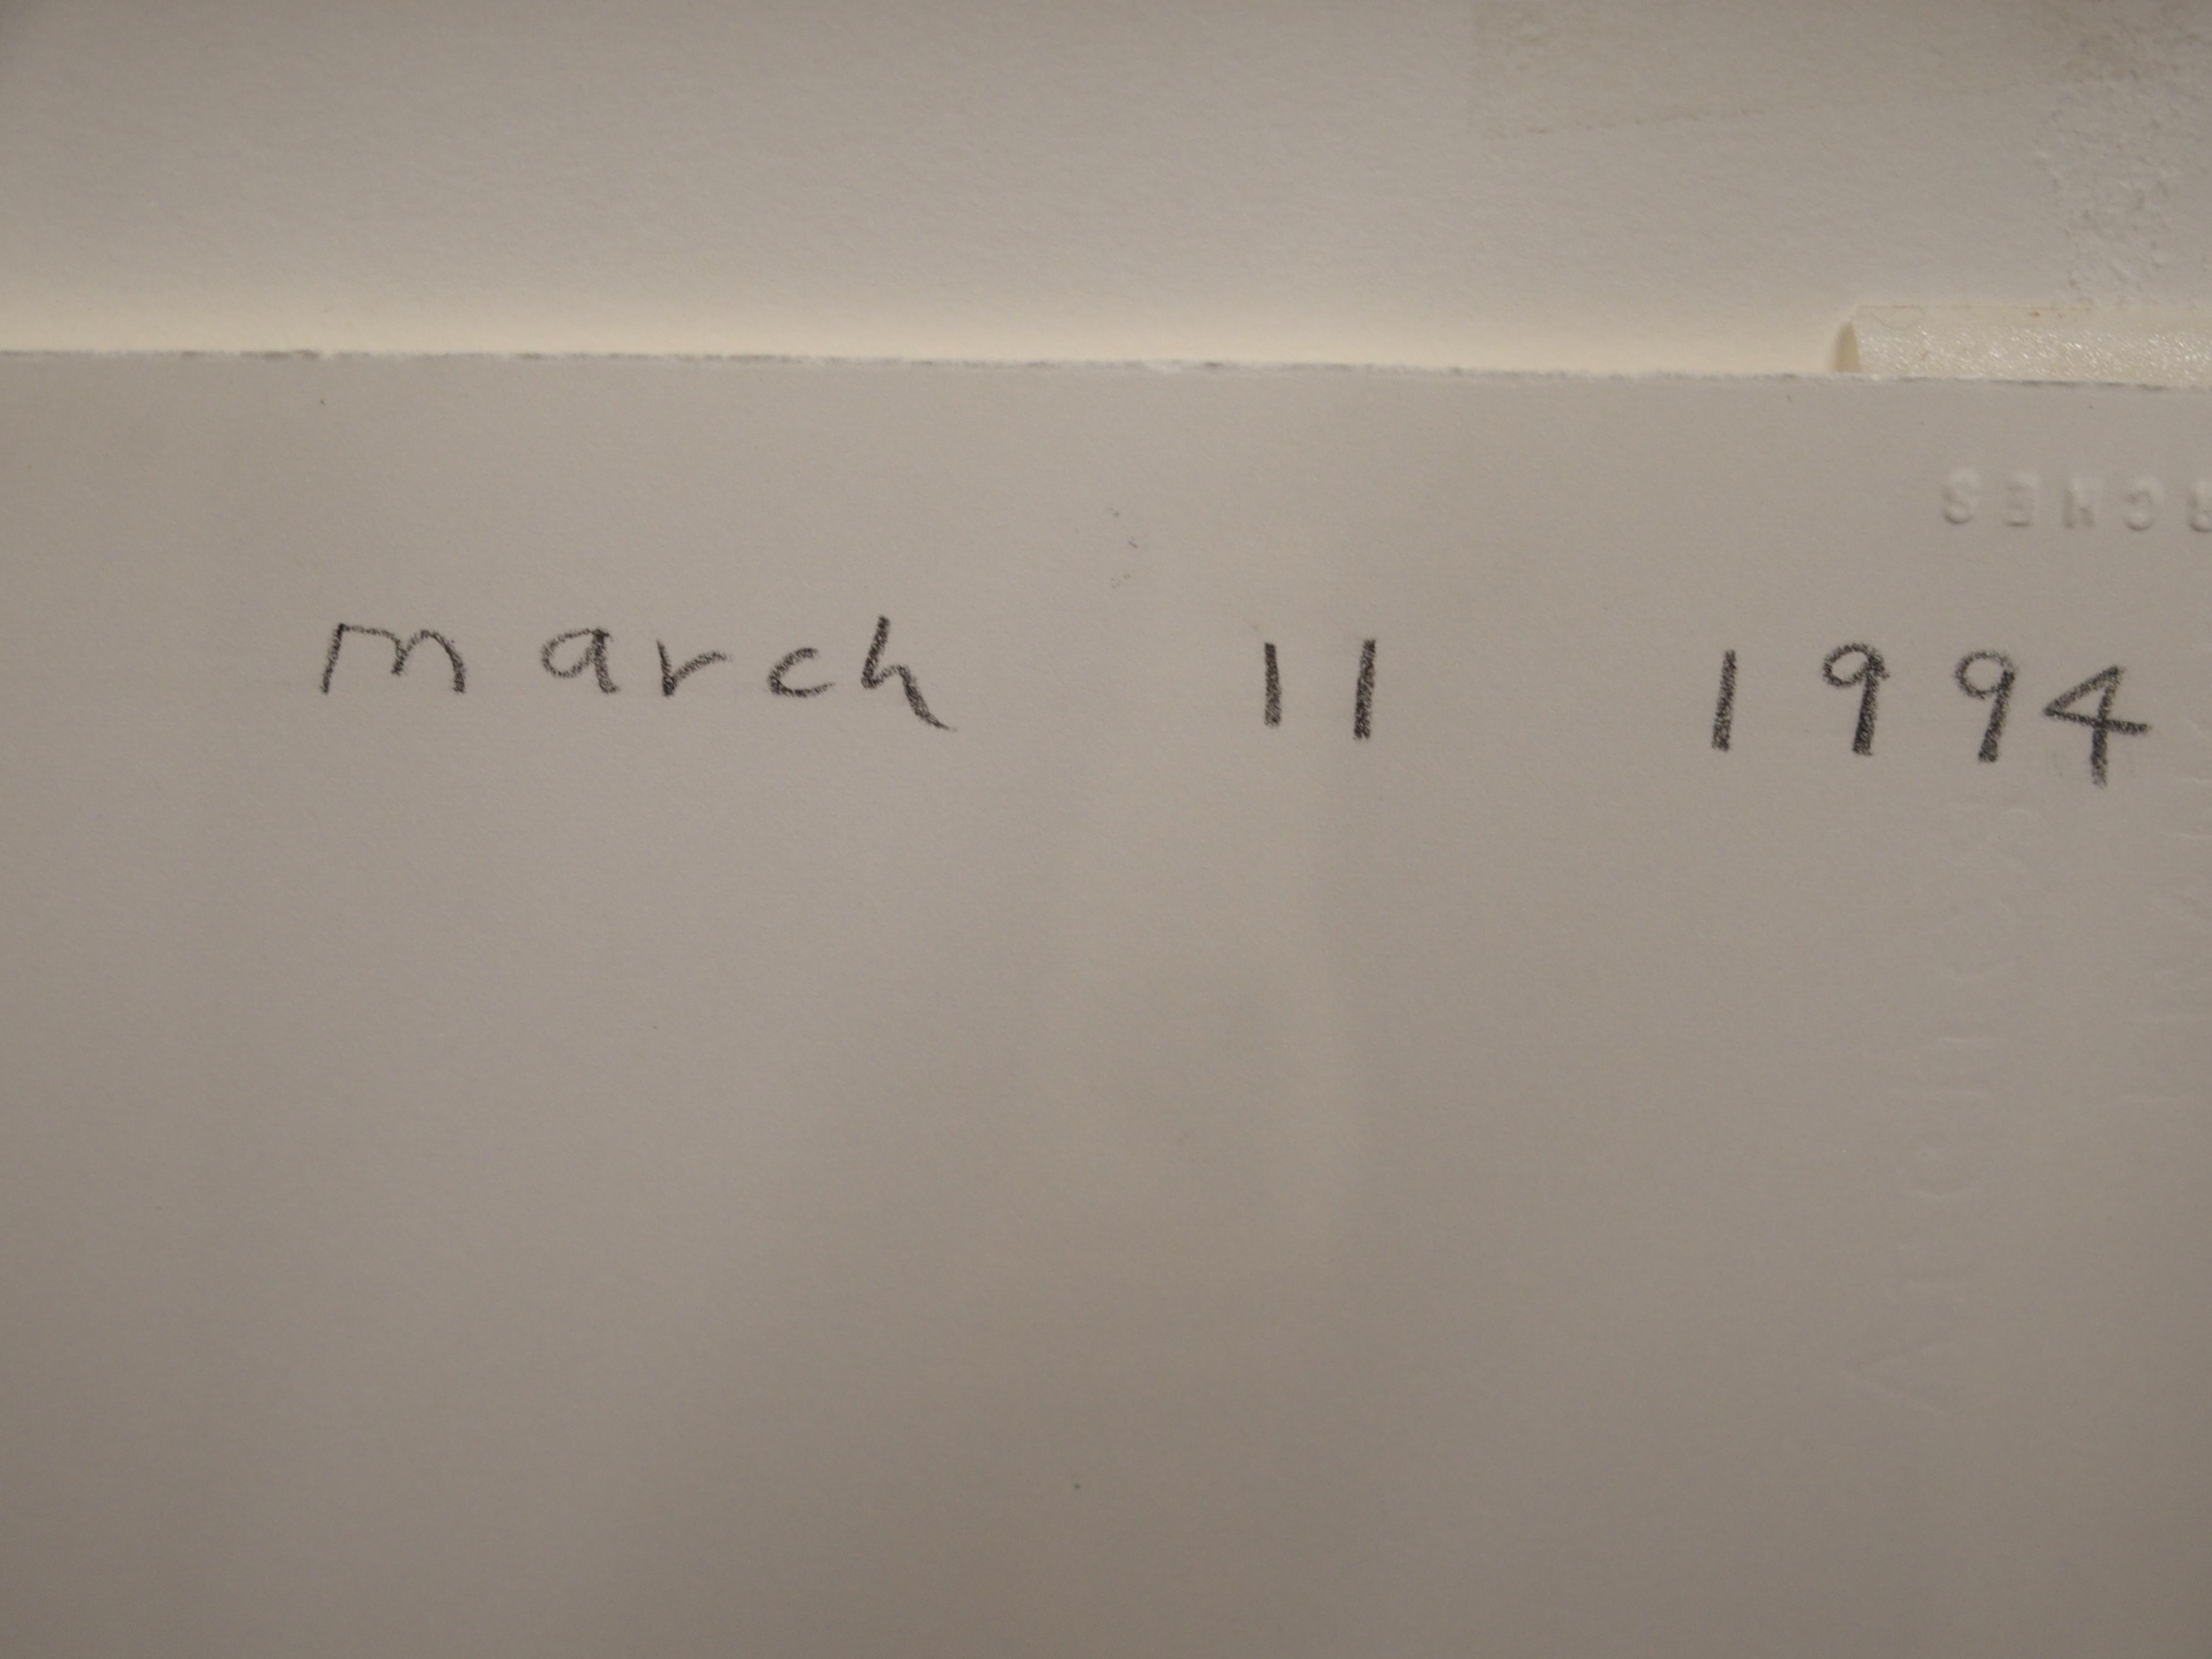 •DAVID HOCKNEY OM, CH, RA (BRITISH b. 1937) WILLIAM HARDIE MARCH 11, 1994 Graphite crayon, signed - Image 4 of 6